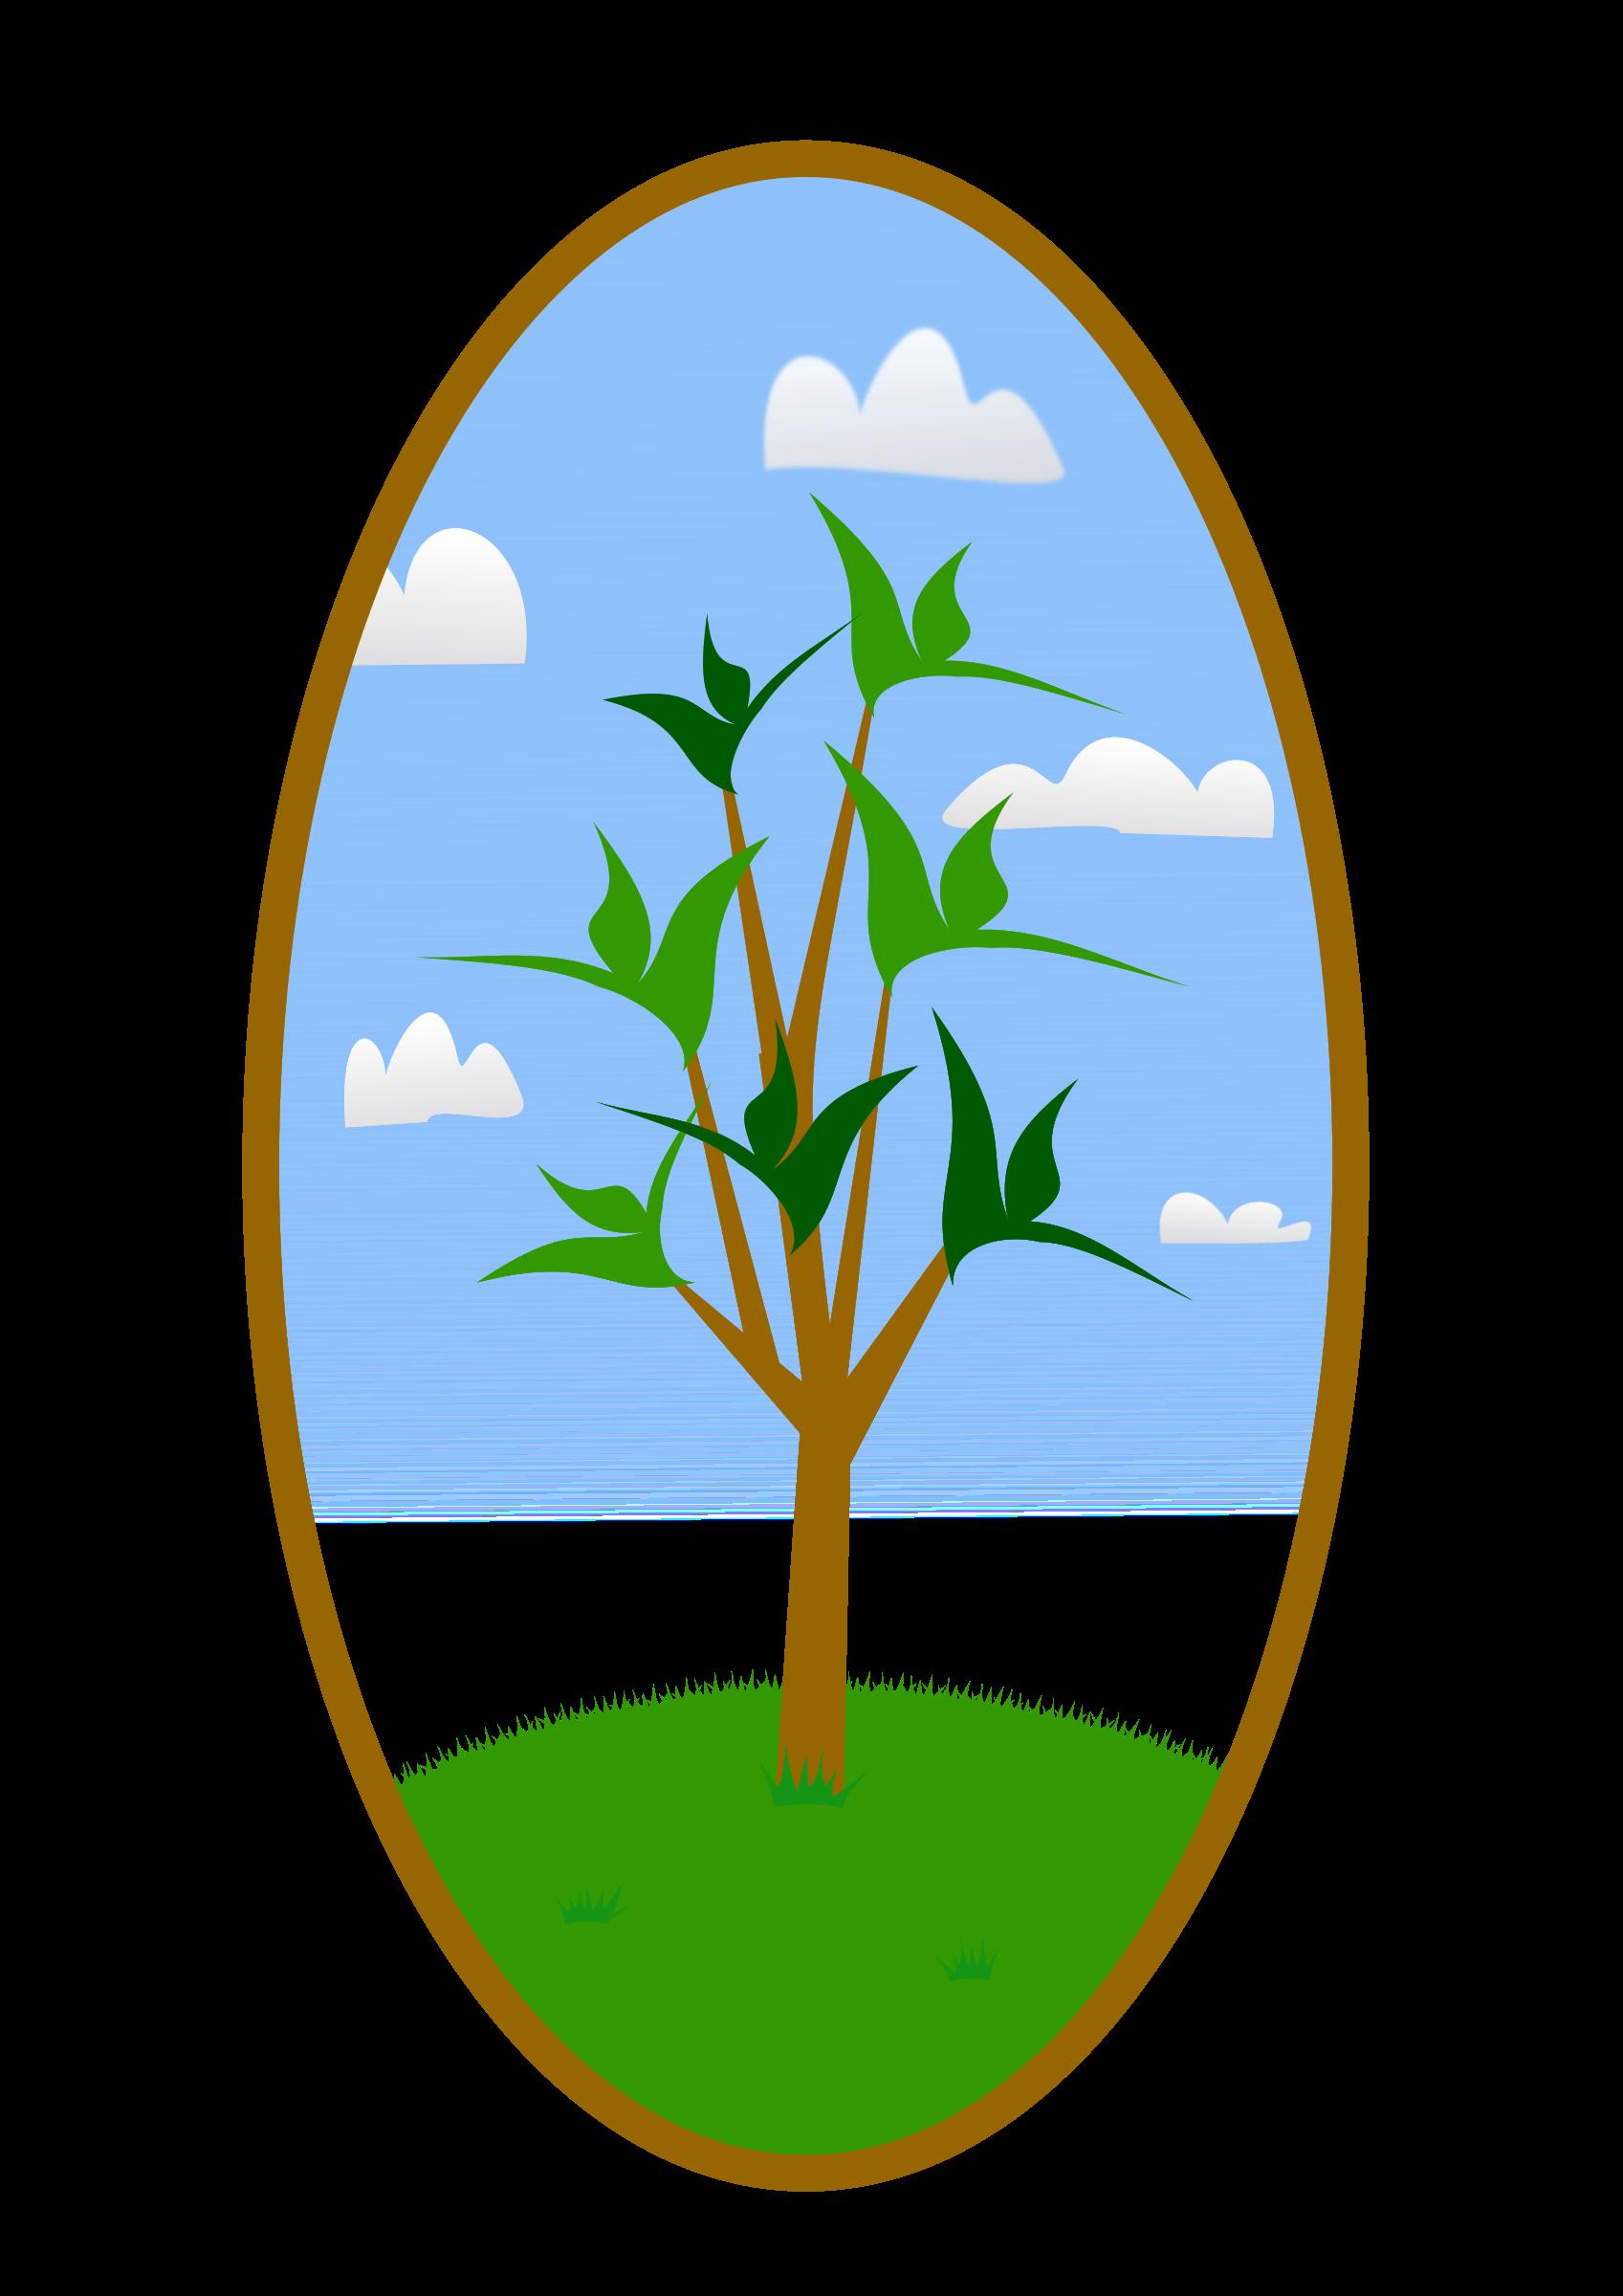 Landscape clipart land scape. Oval tree big image